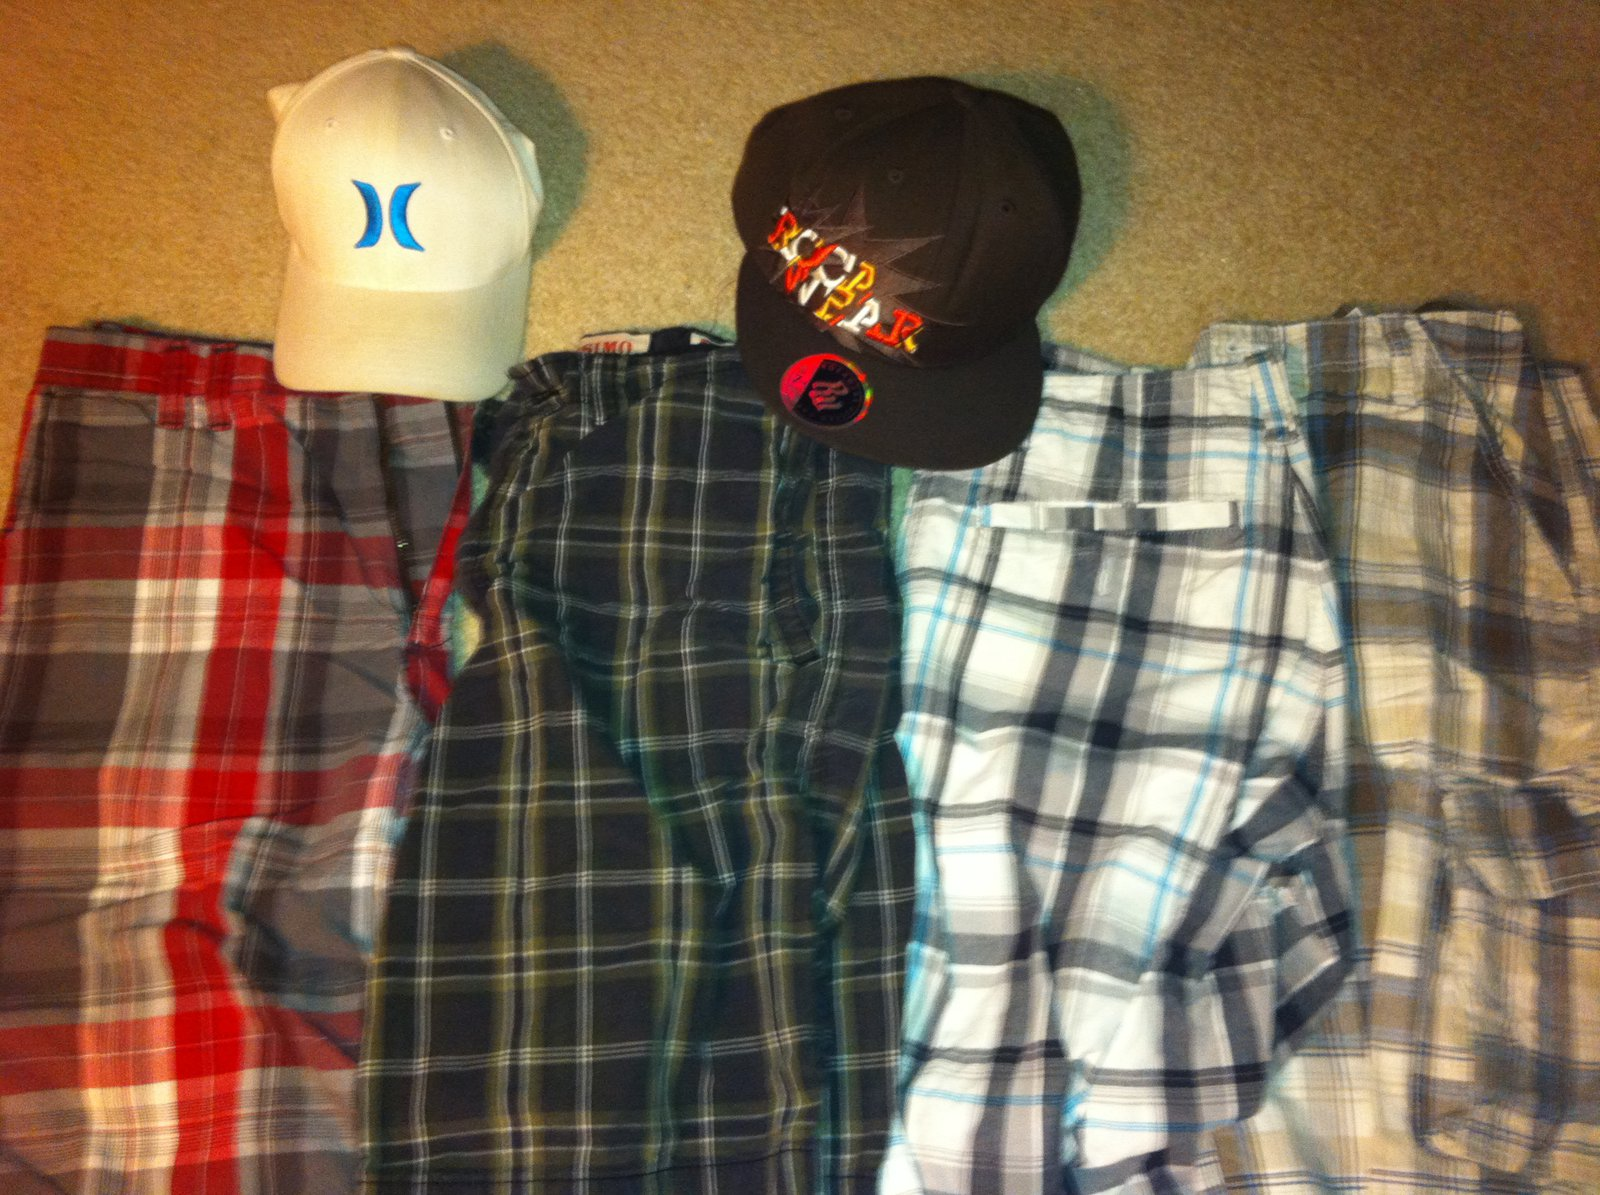 Shorts and hats